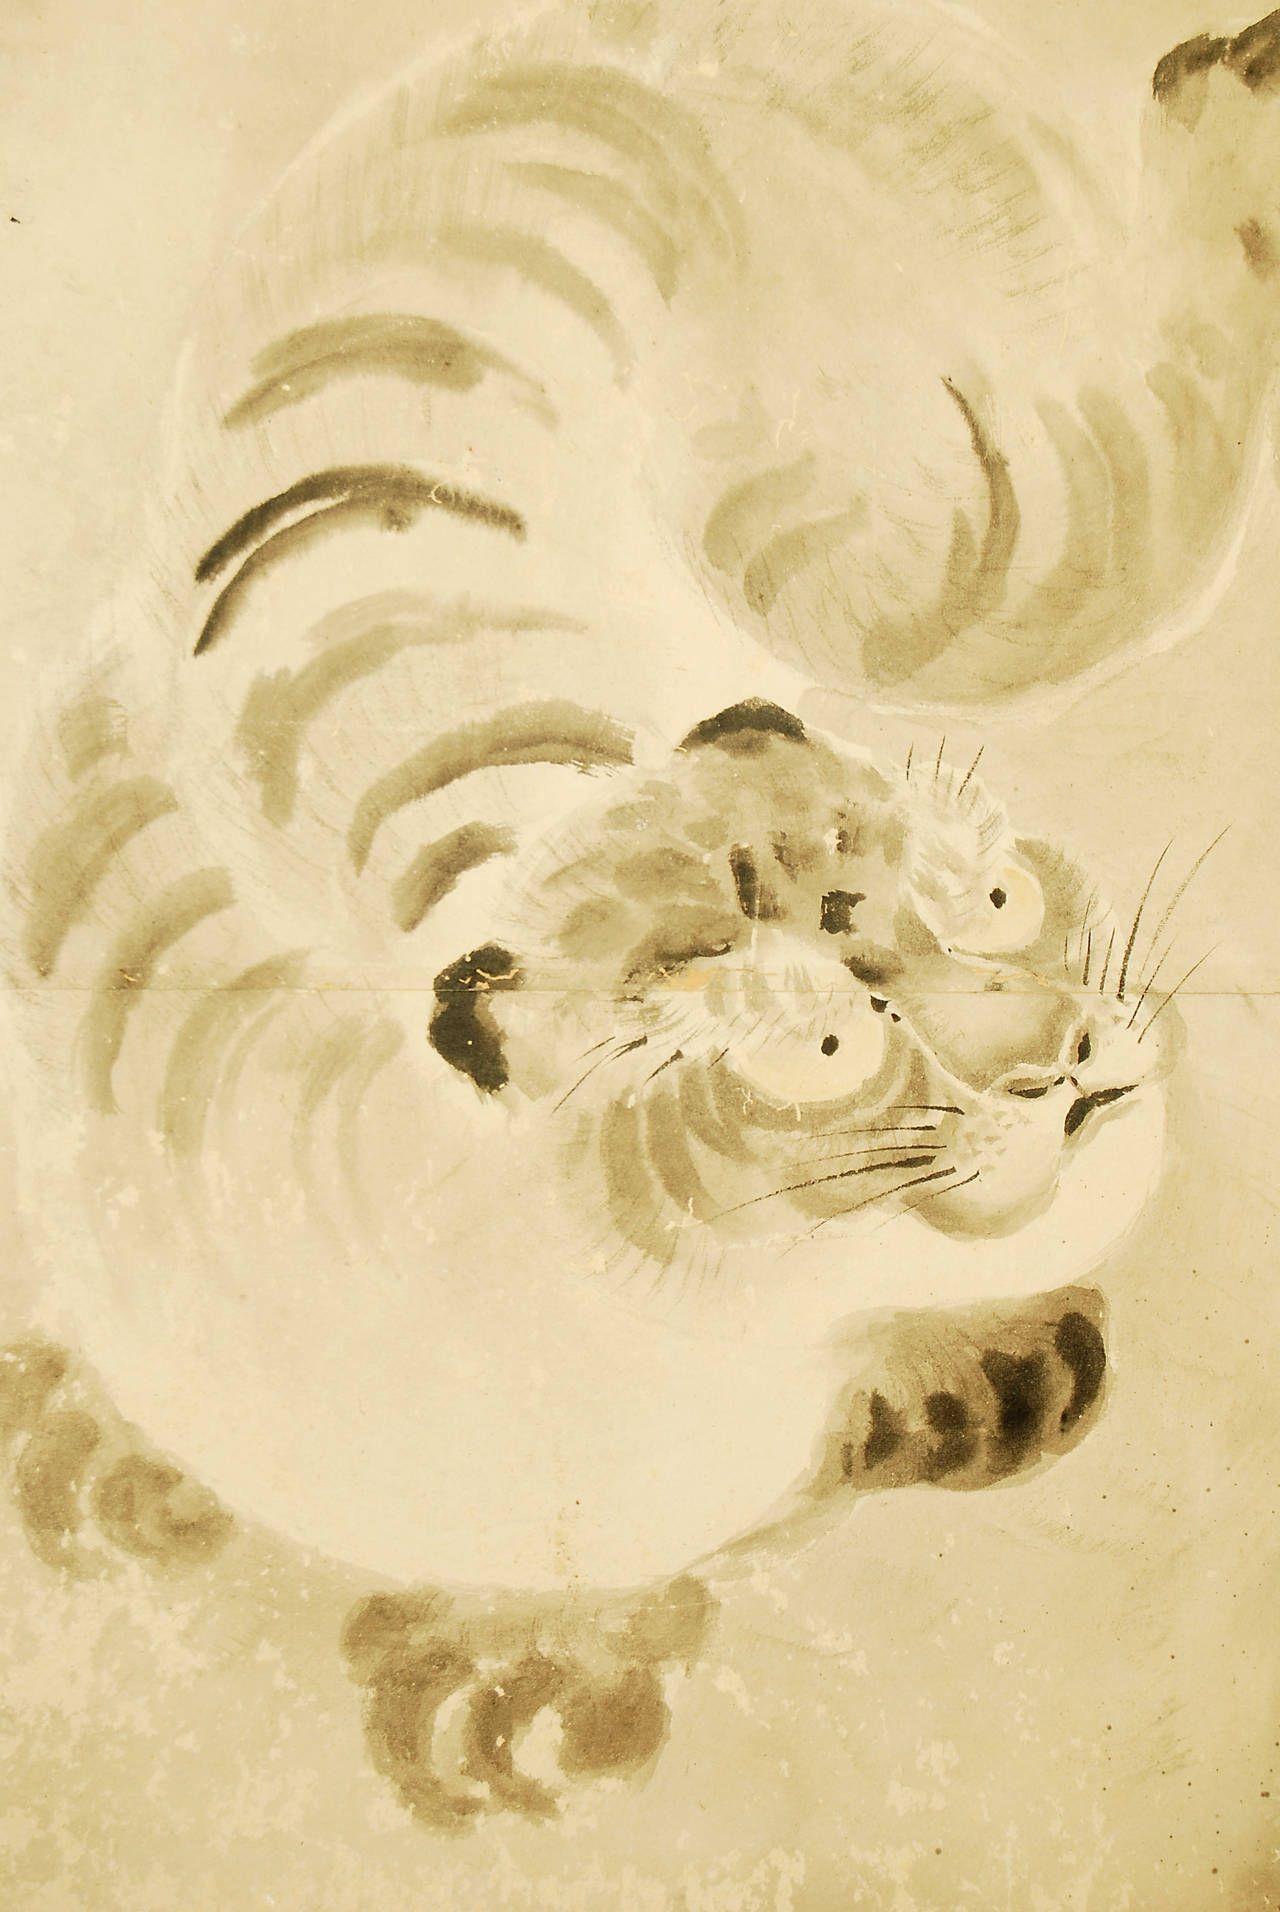 Antique Japanese Kano School Painting by Yosenin Korenobu   Japanese